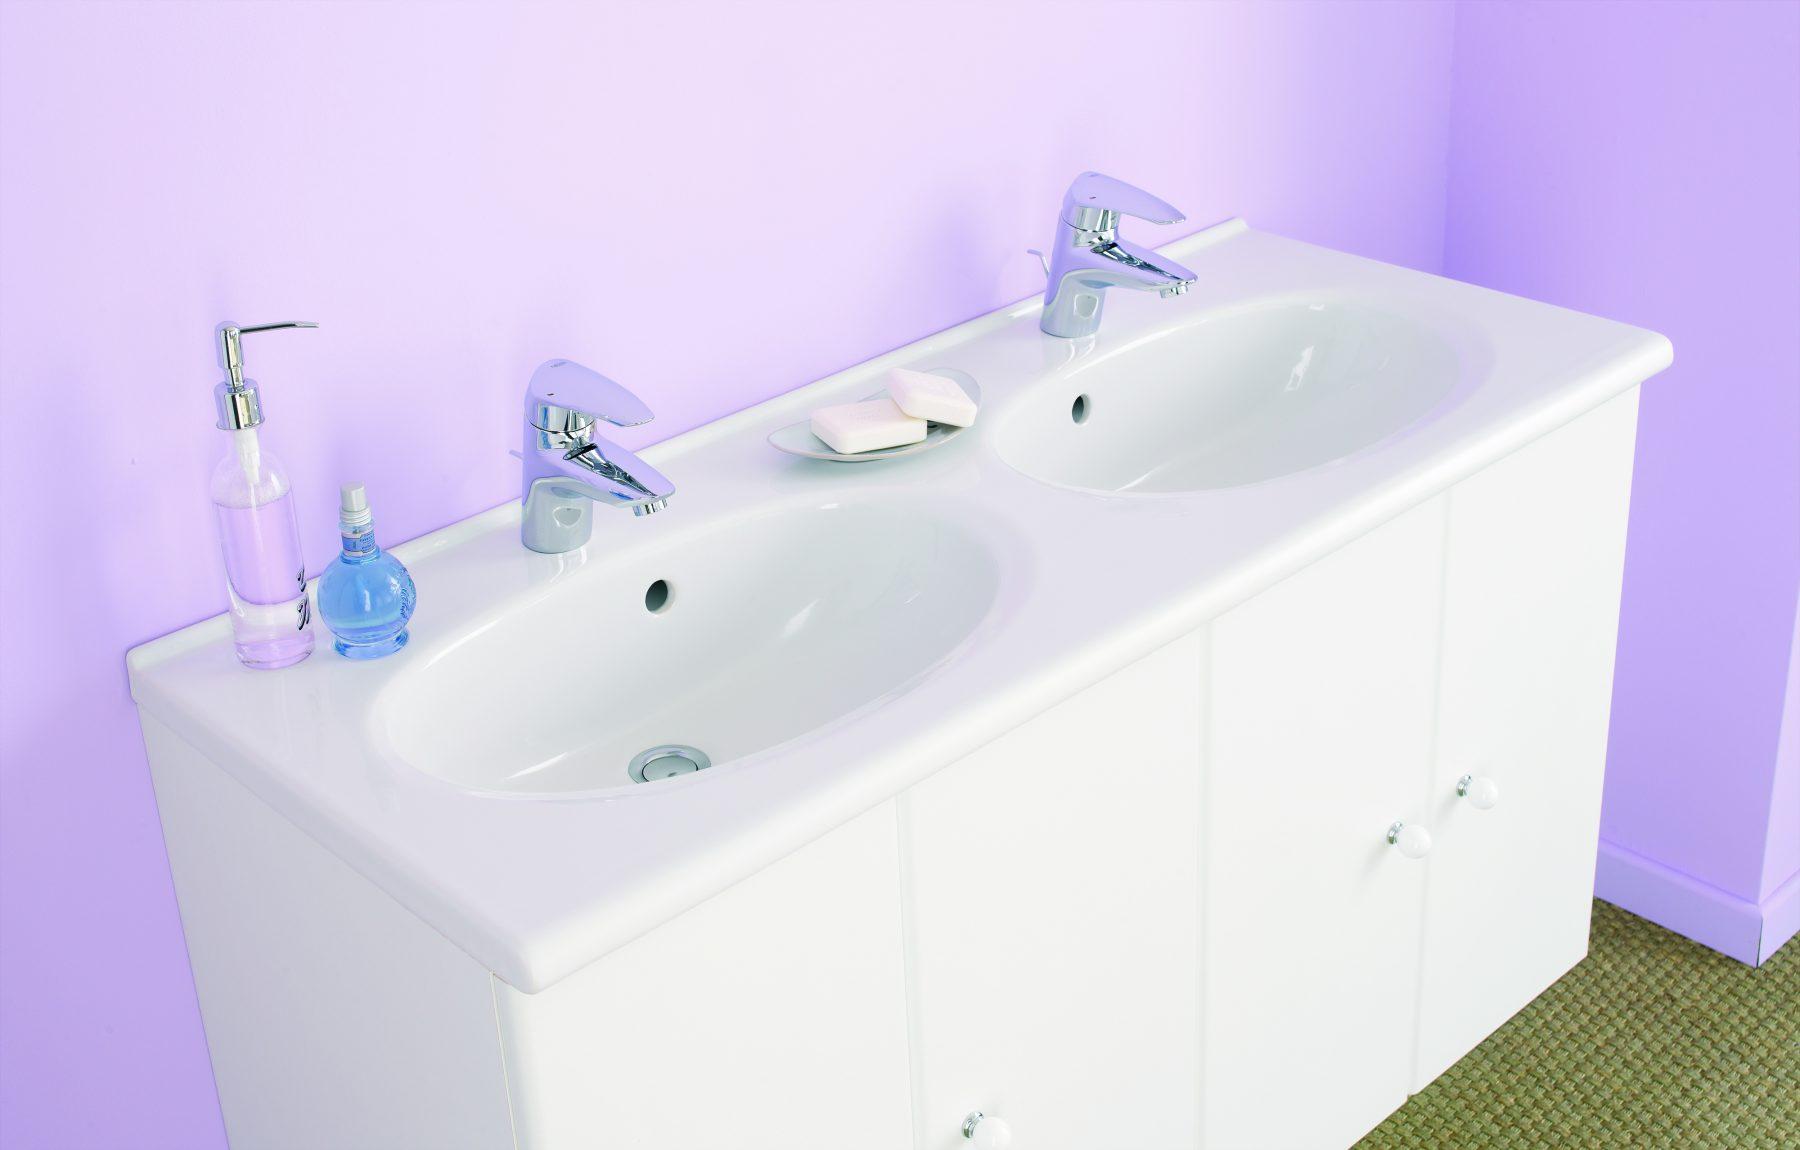 plan de toilette salle de bains poser fedora allia. Black Bedroom Furniture Sets. Home Design Ideas